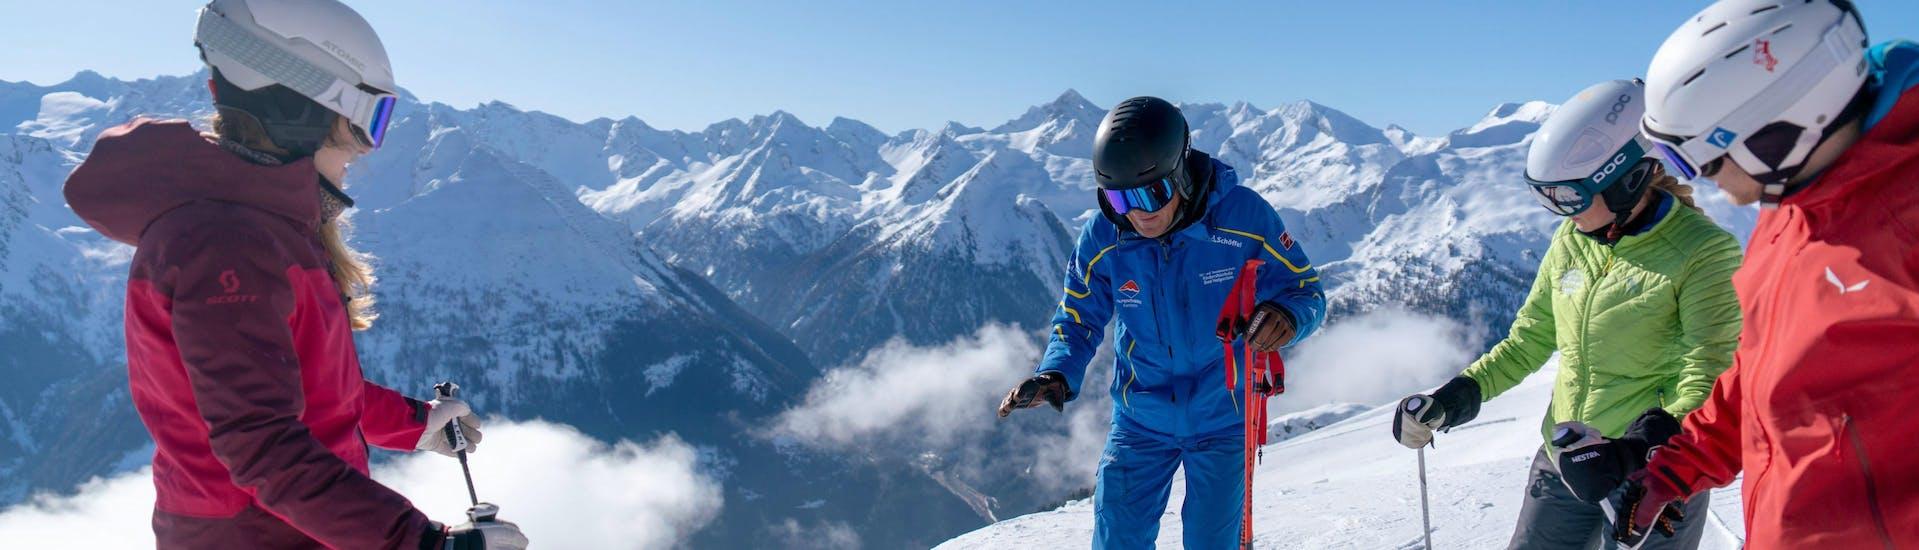 Adult Ski Lessons for Beginners with Skischule Bad Hofgastein - Hero image